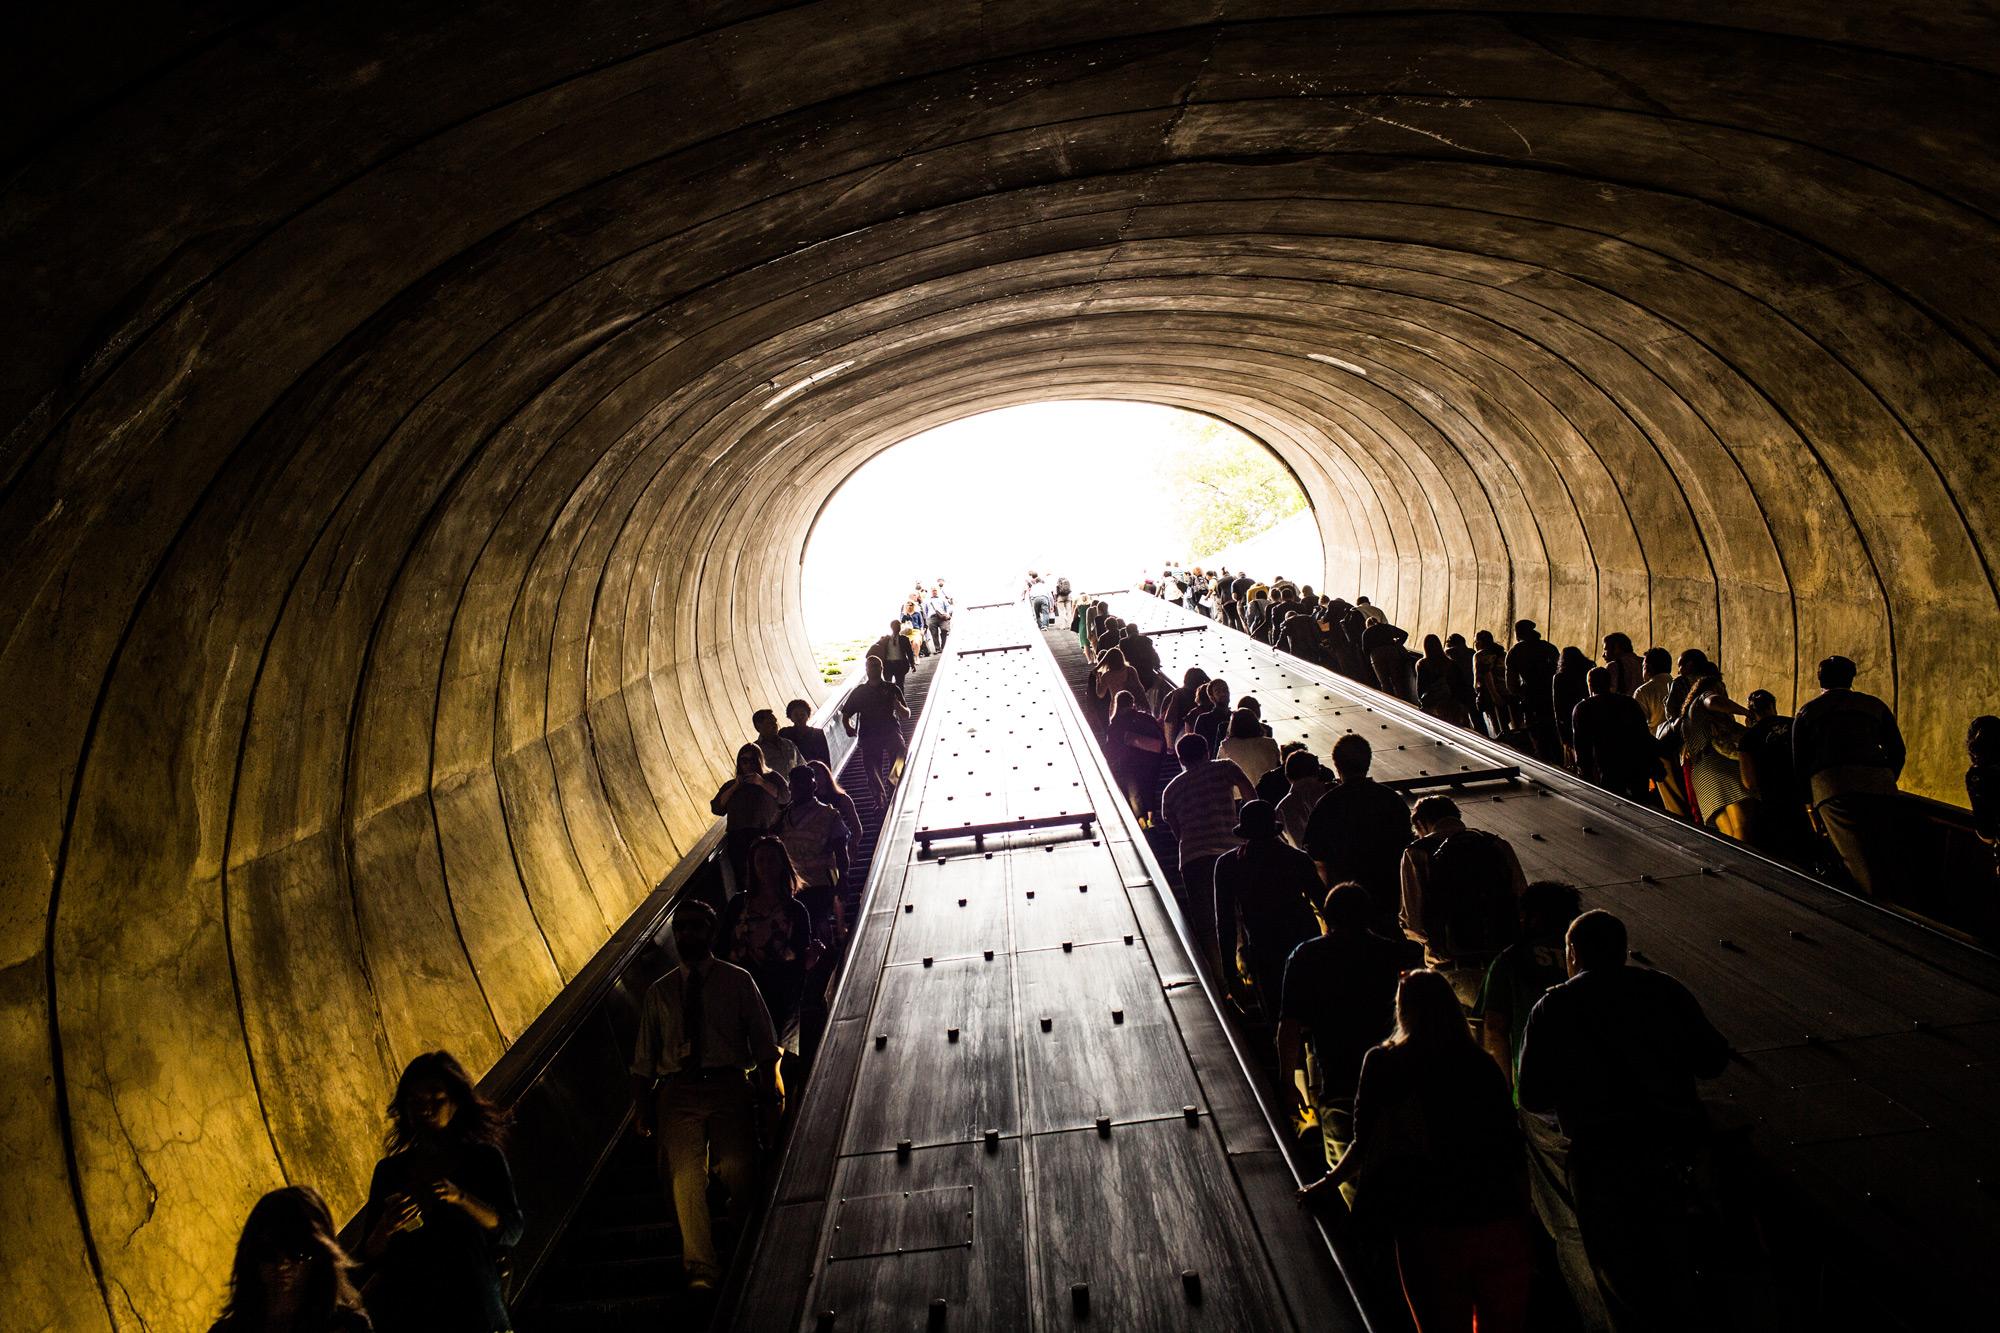 dupont-circle-escalator.jpg